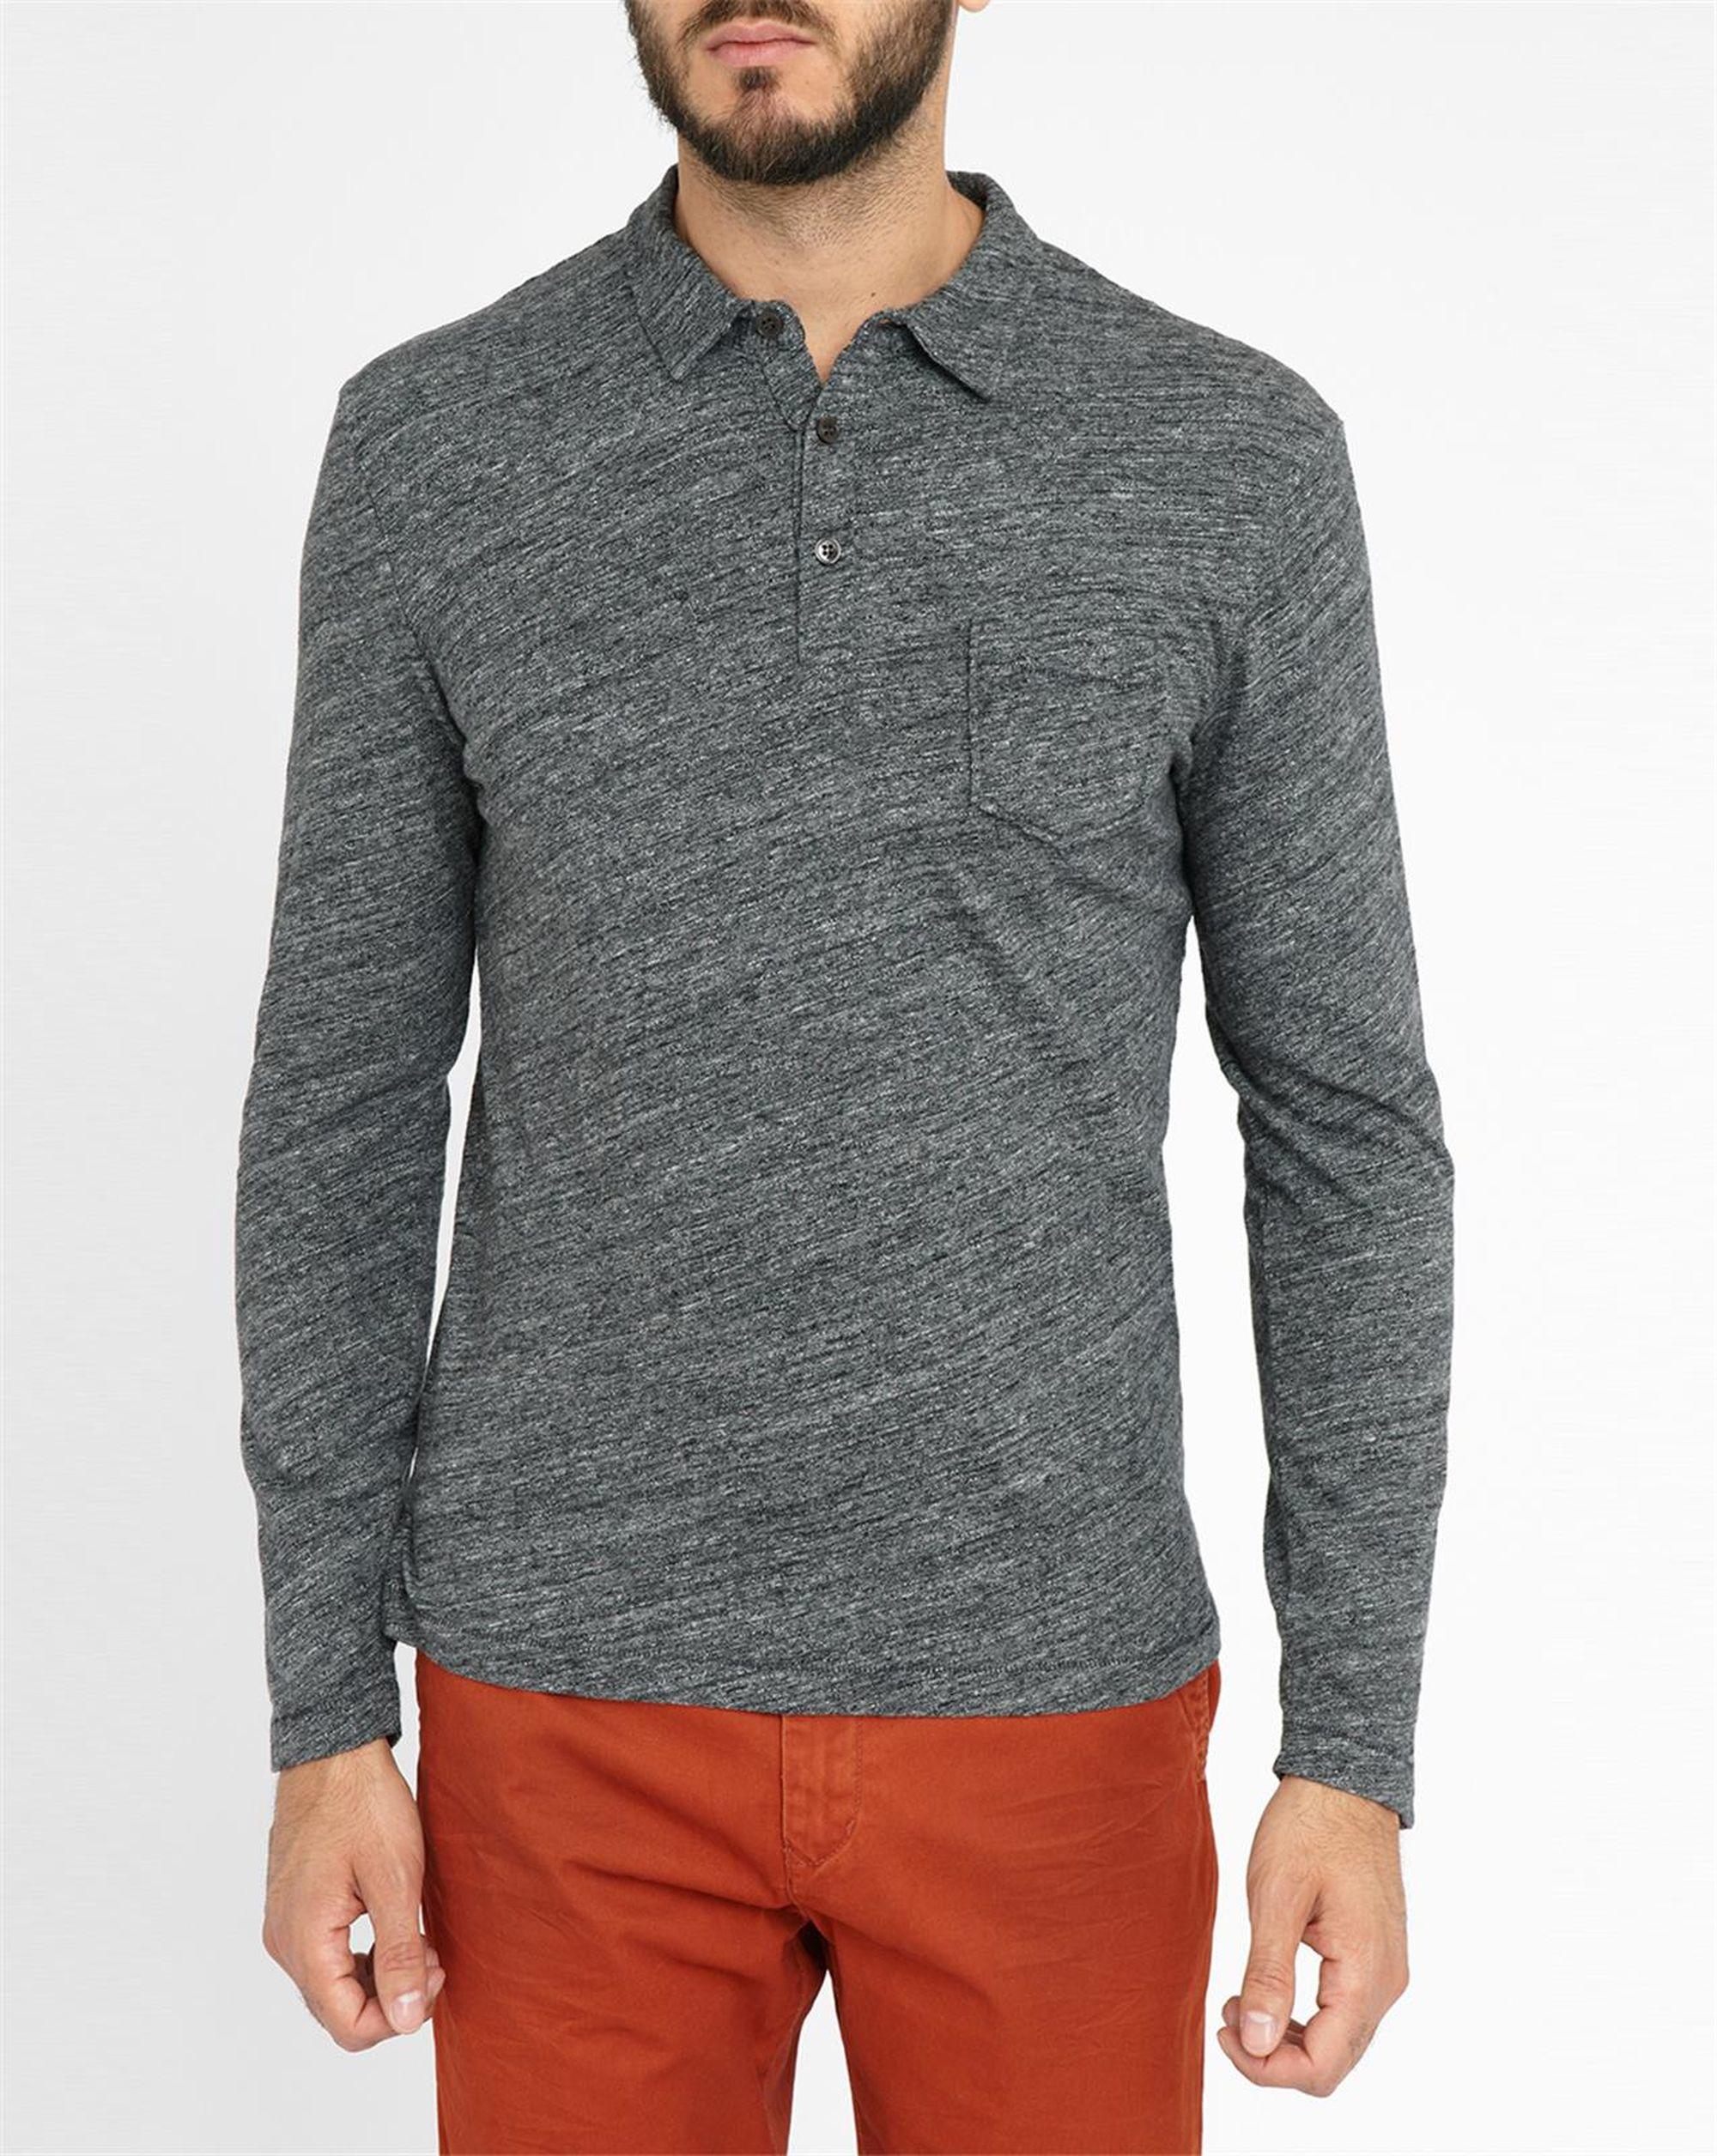 Harris Wilson Mottled Charcoal Jersey Knit Ls Polo Shirt